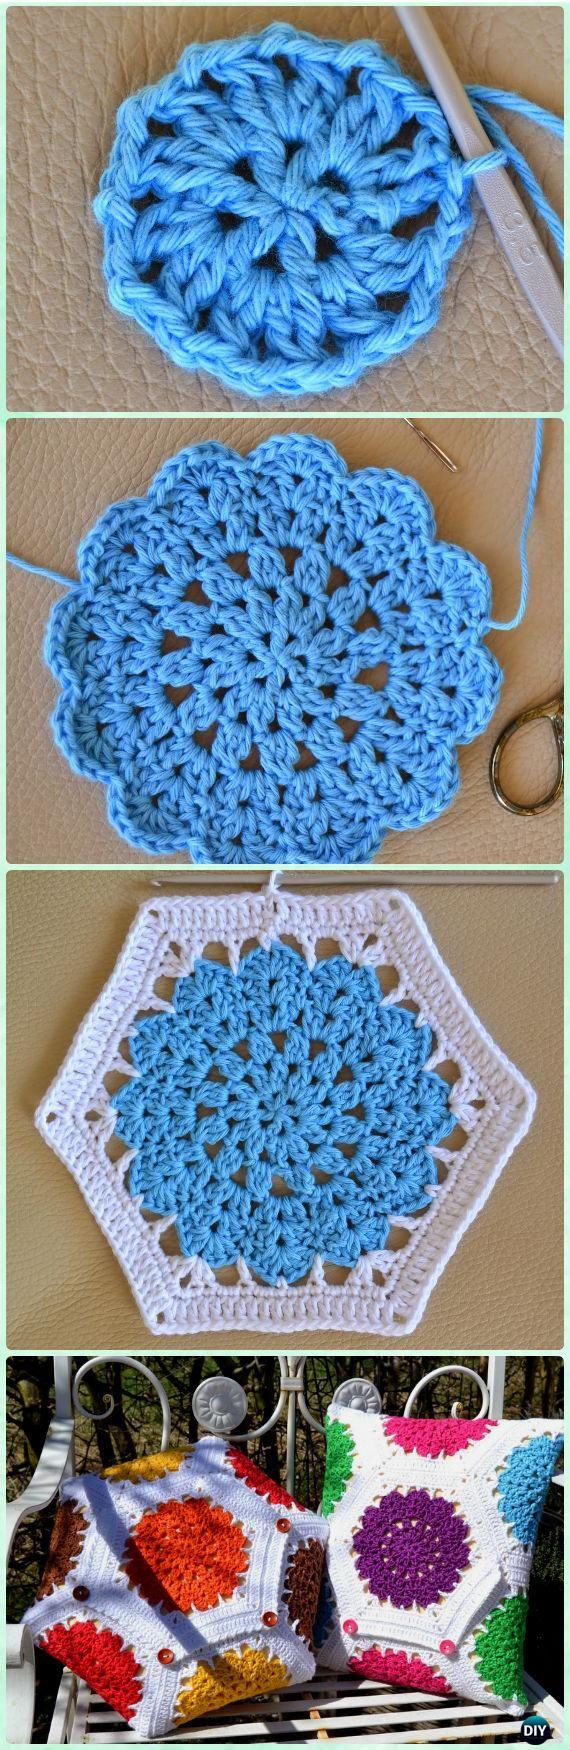 Crochet Mandala Flower Hexagon Motif Free Pattern – Crochet Hexagon Motif Free Patterns